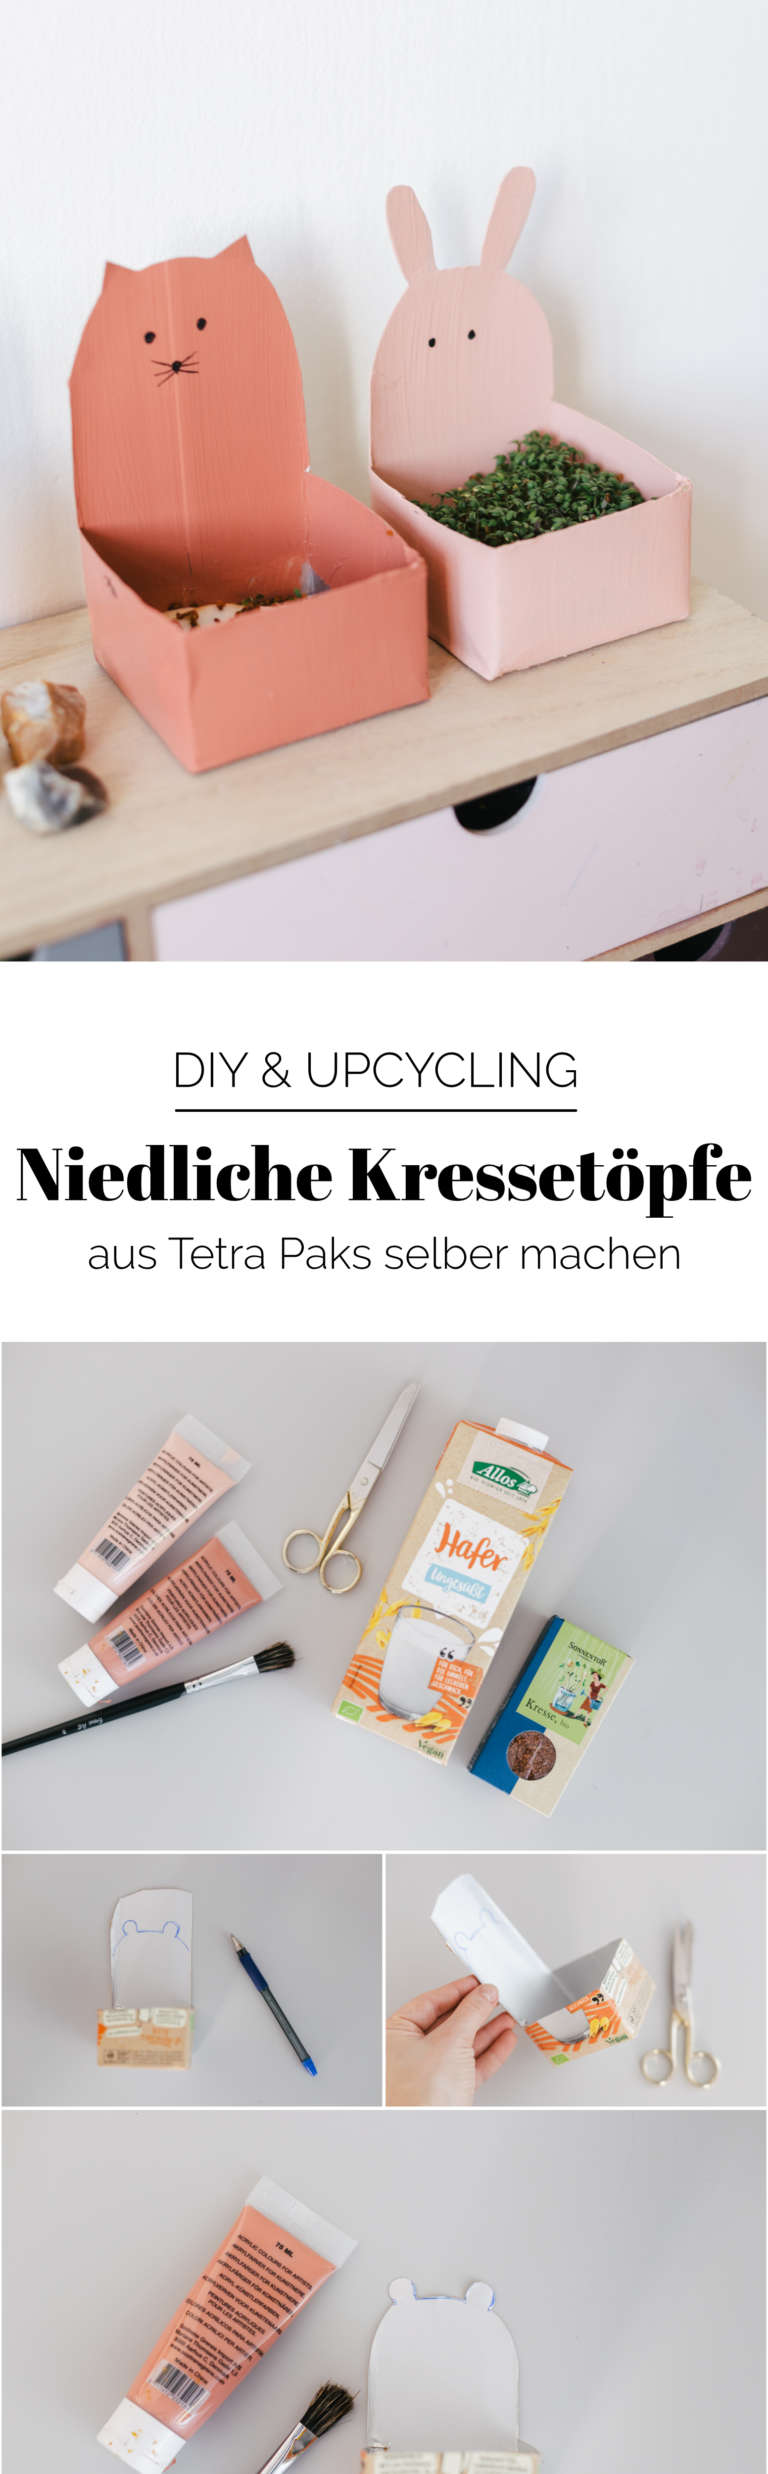 DIY Anleitung Upcycling Kressetopfe Tetra Pak Upcycling Idee fuer Kinder